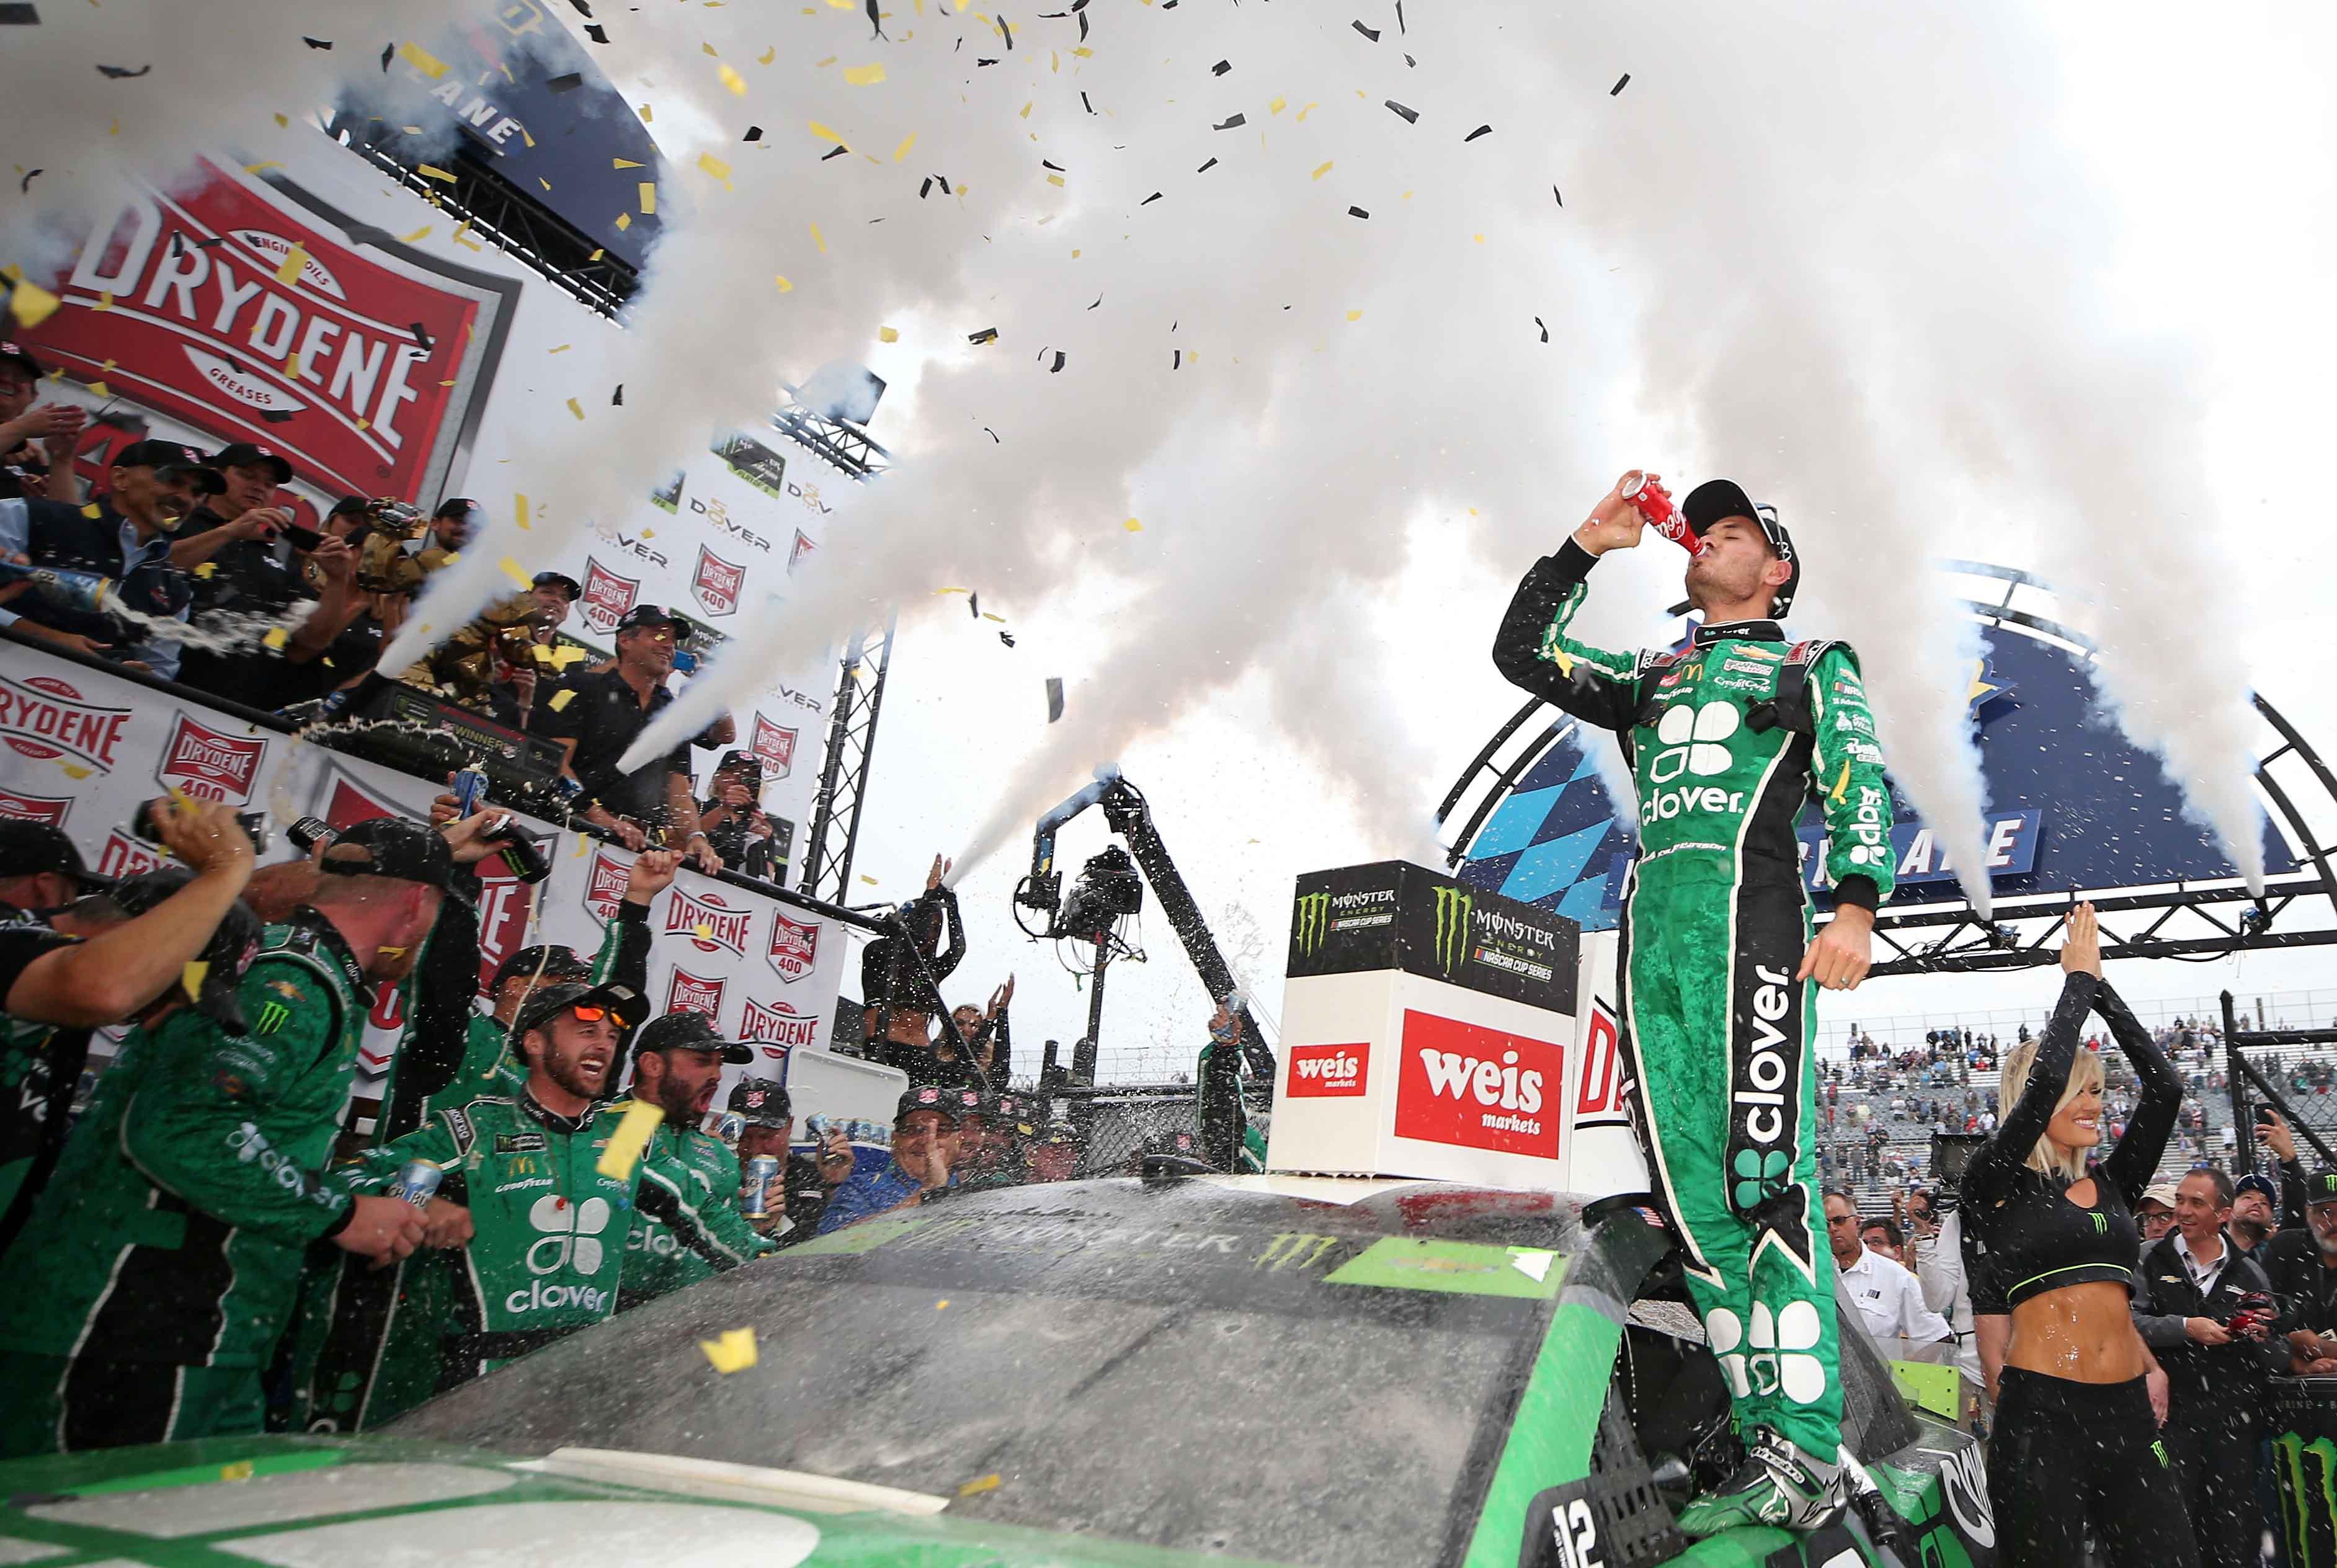 Kyle Larson in NASCAR victory lane at Dover International Speedway